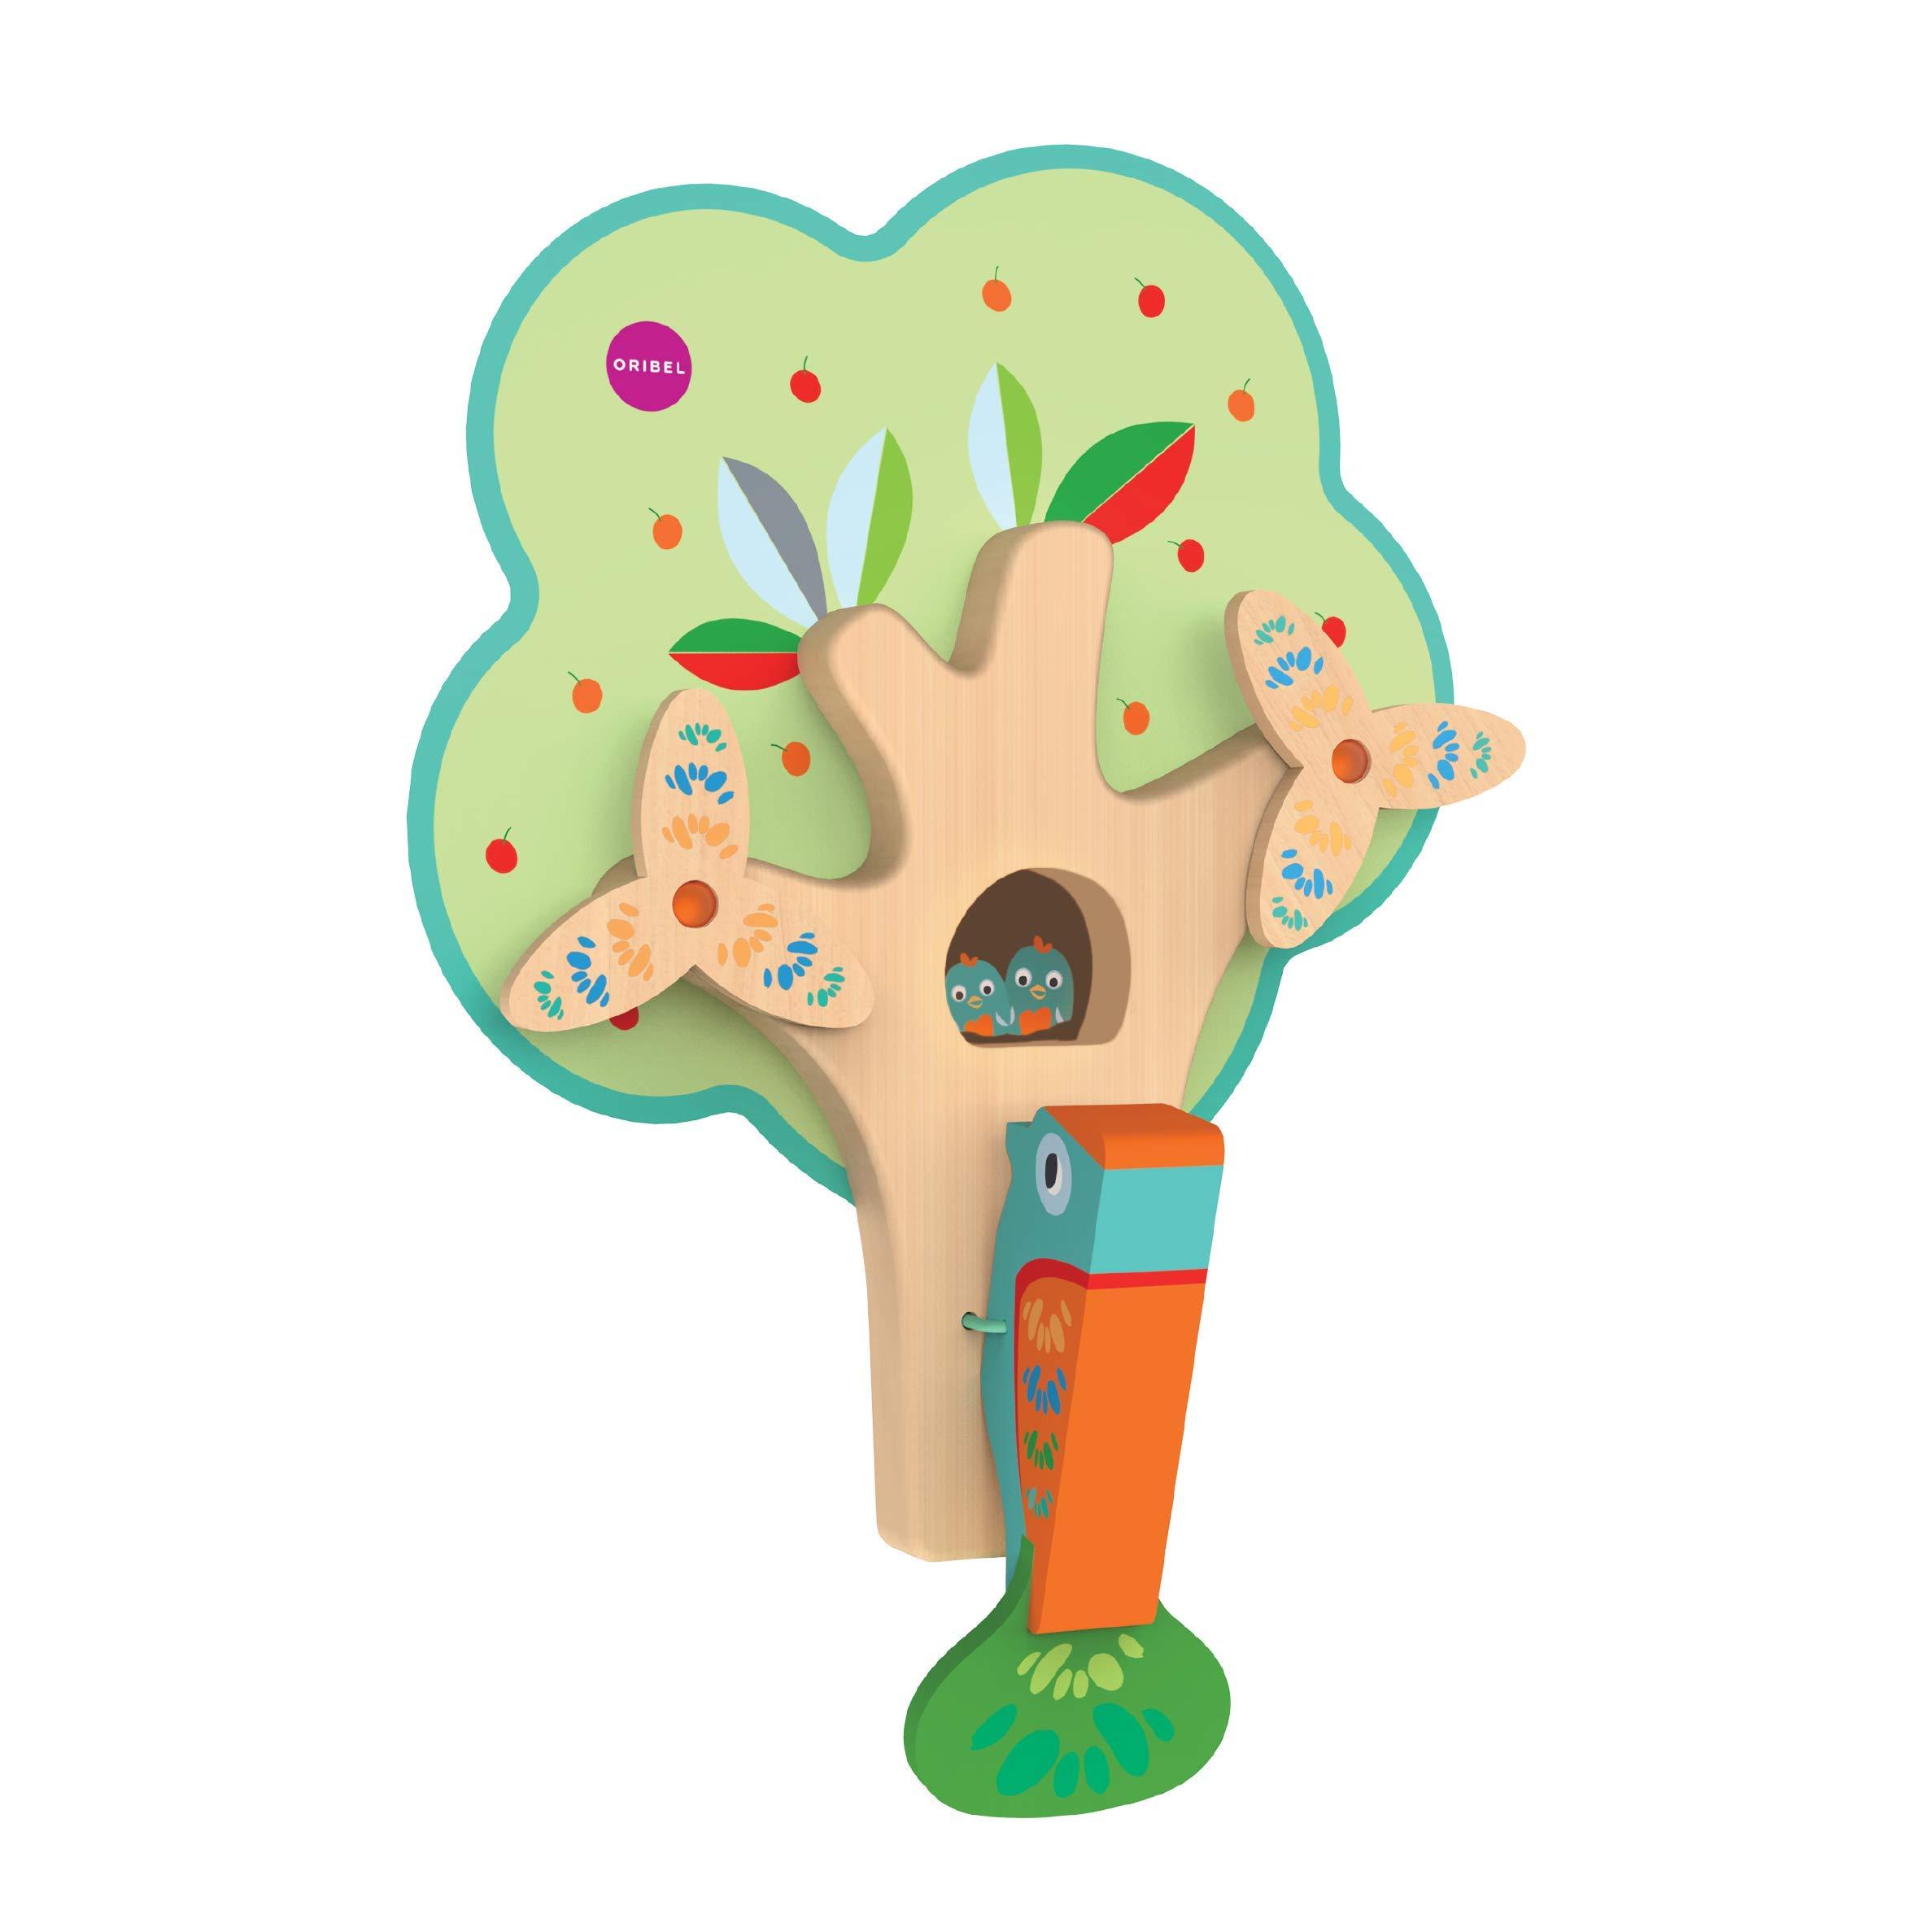 ORIBEL VertiPlay Wall Toys Play Wall Combo Set (Tree Top Adventure, Slidey Spidey, Woodpecker, Xylophone, Door Knocker) by ORIBEL (Image #5)